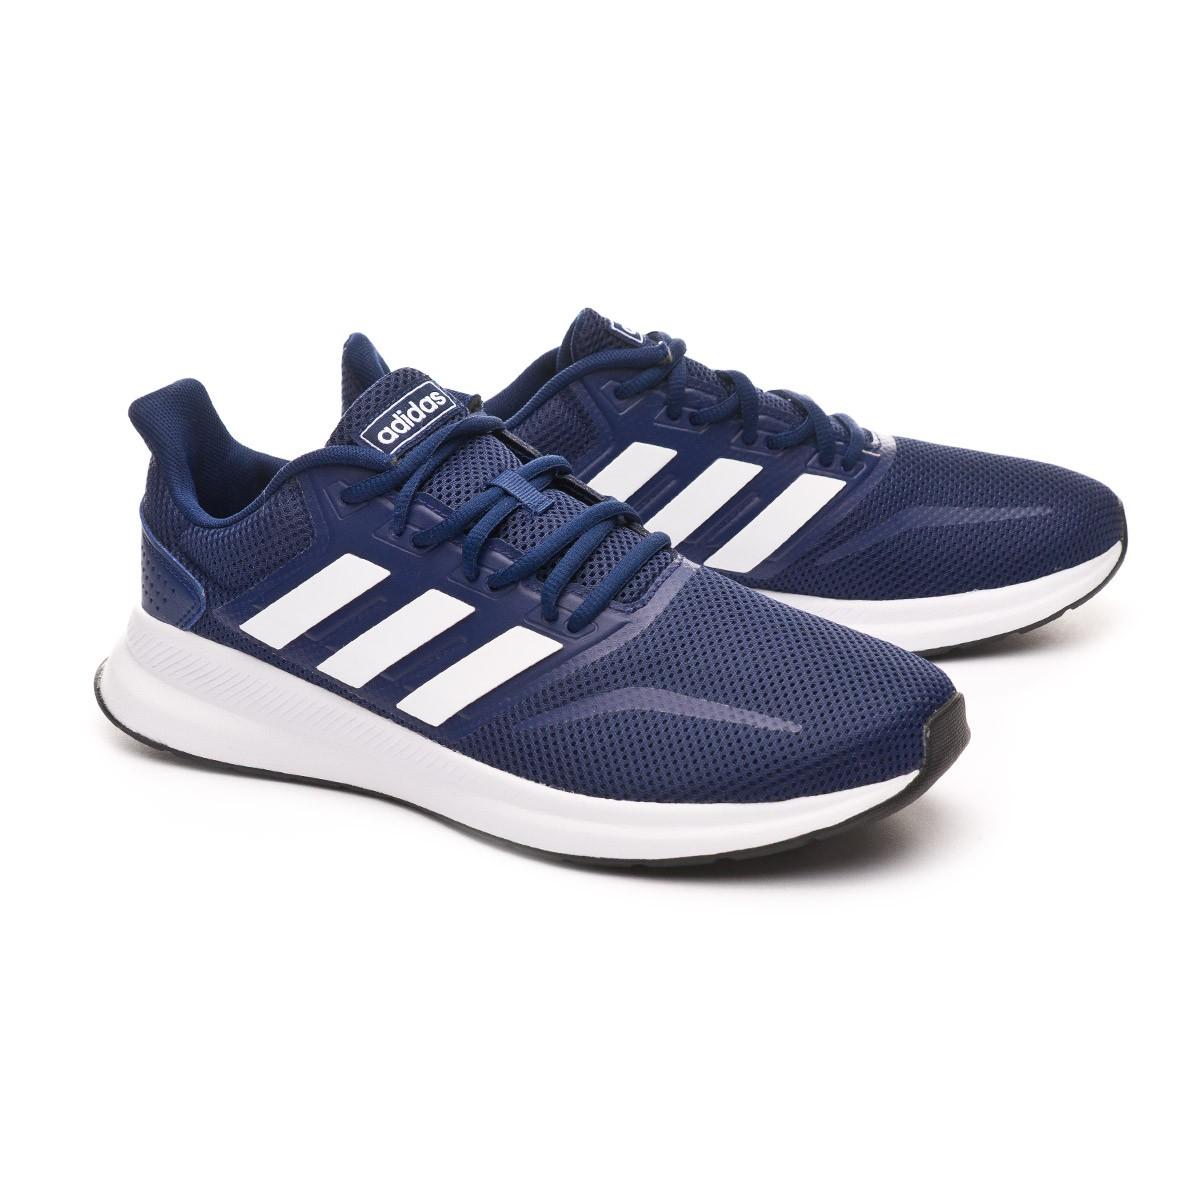 Trainers adidas Run Falcon Dark blue